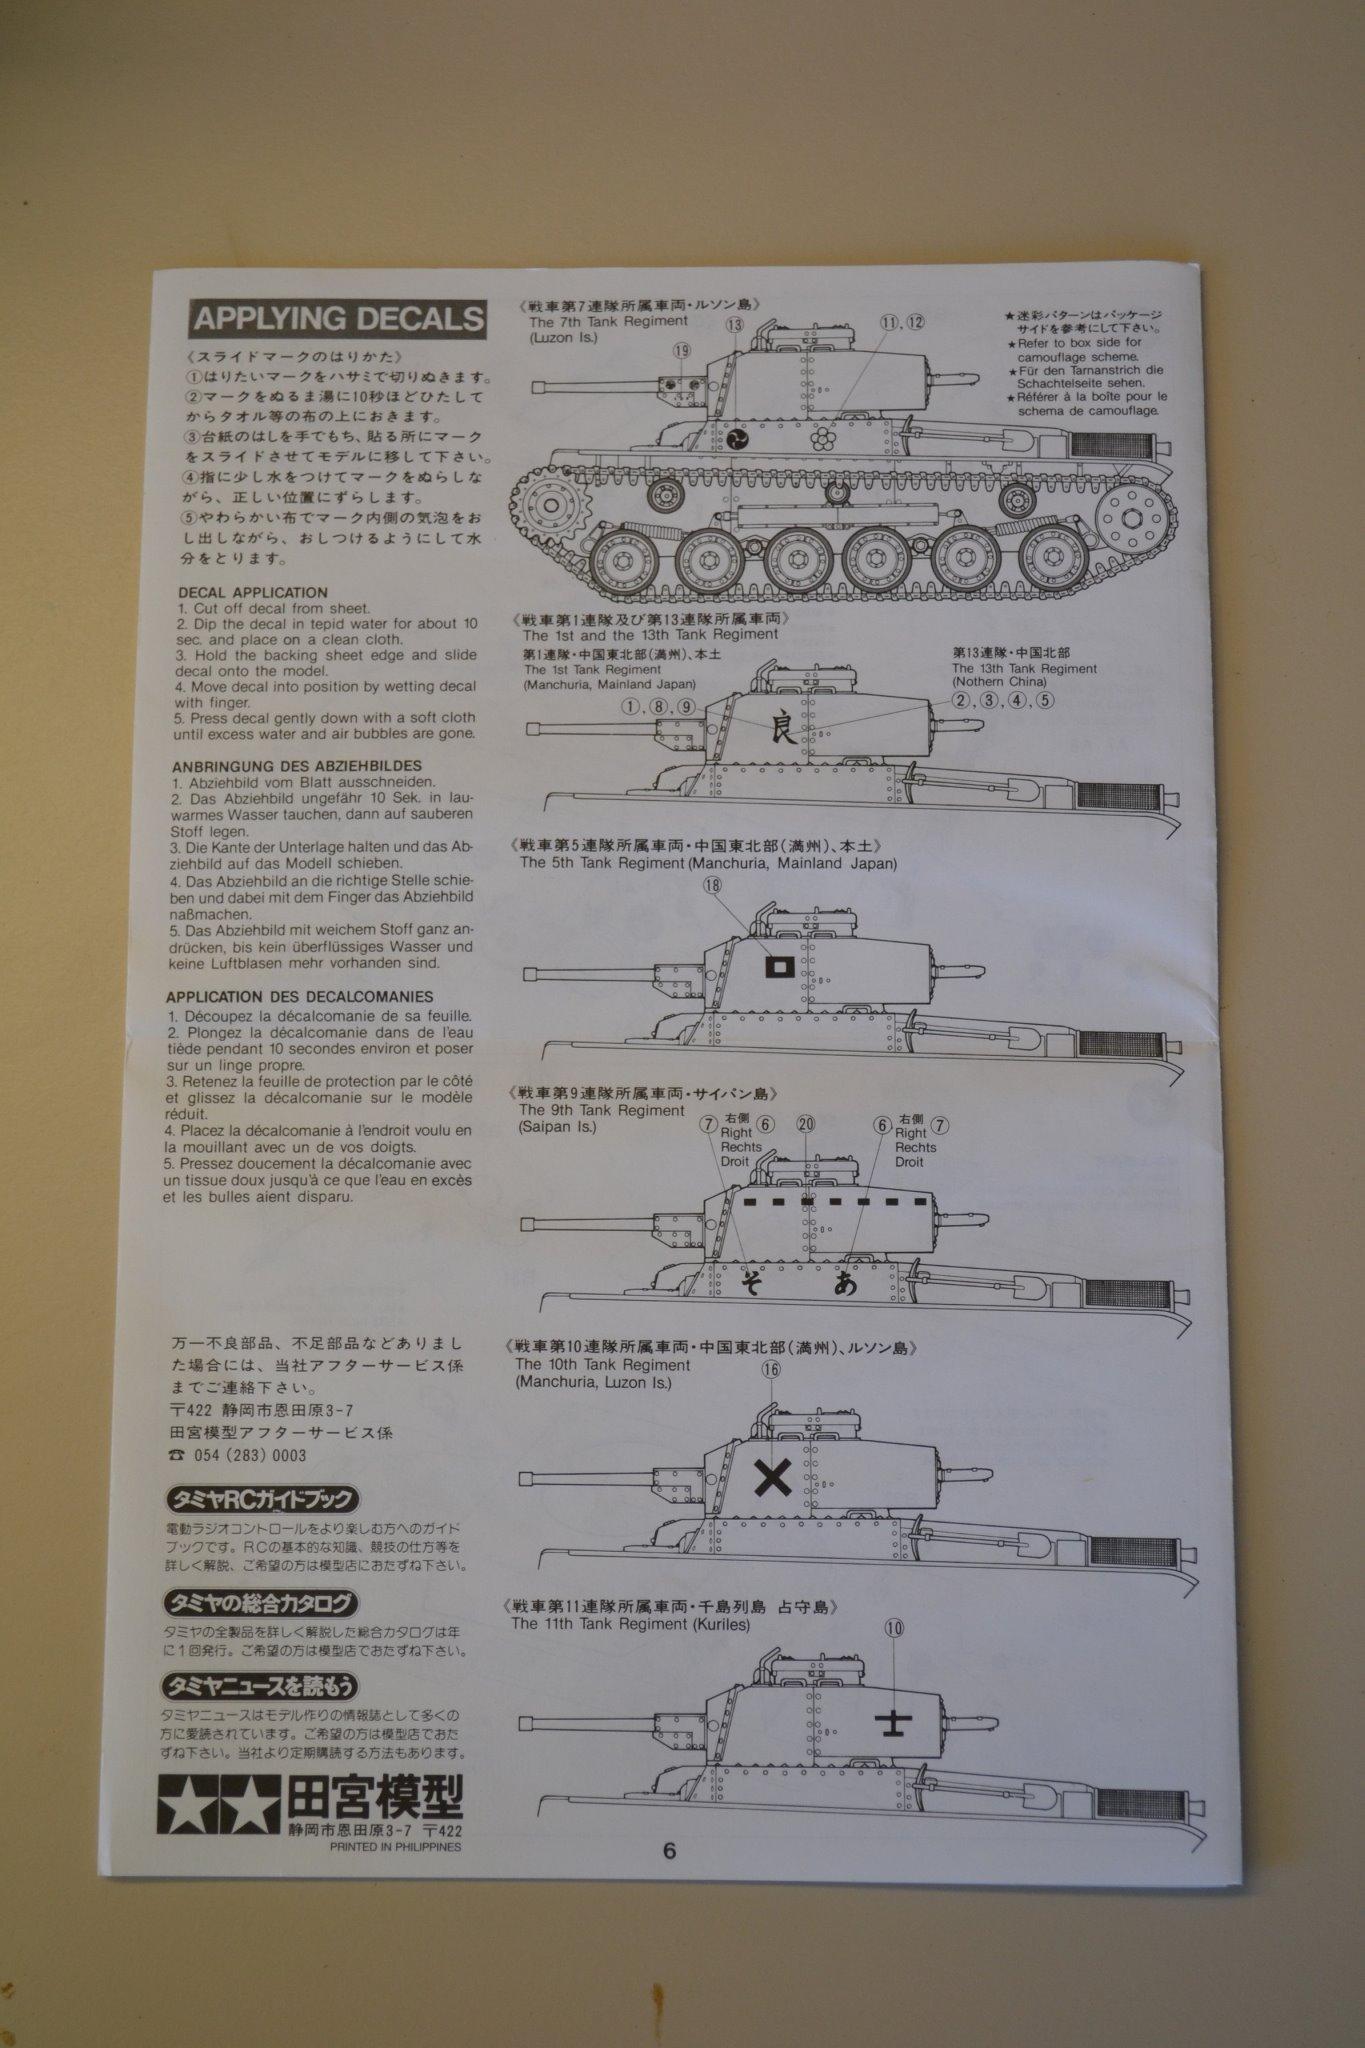 DSC_6801.JPG